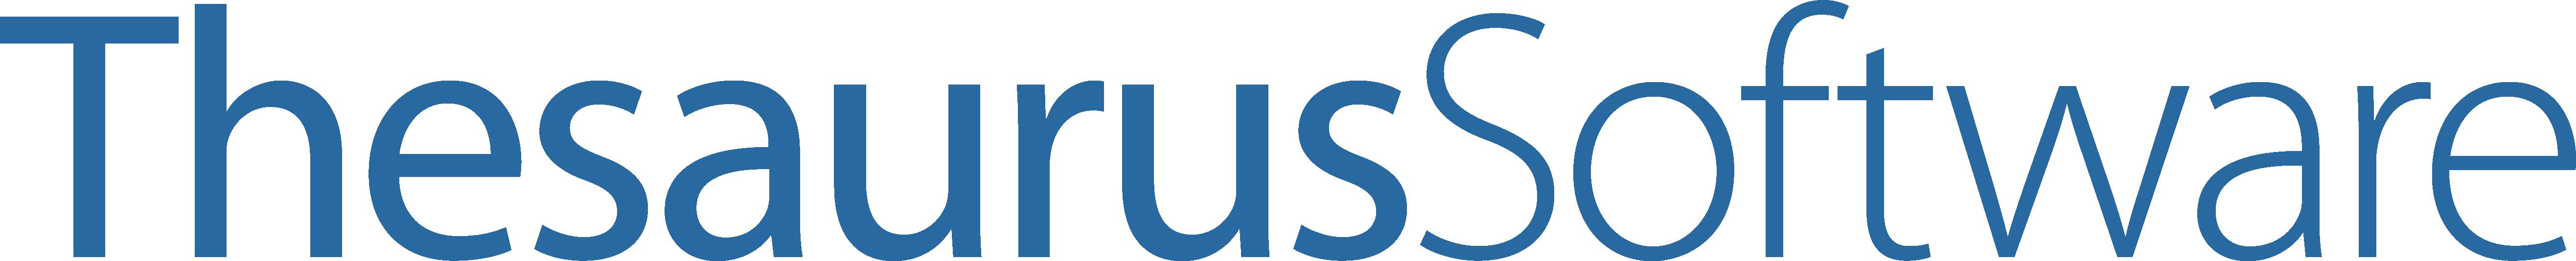 Thesaurus Software